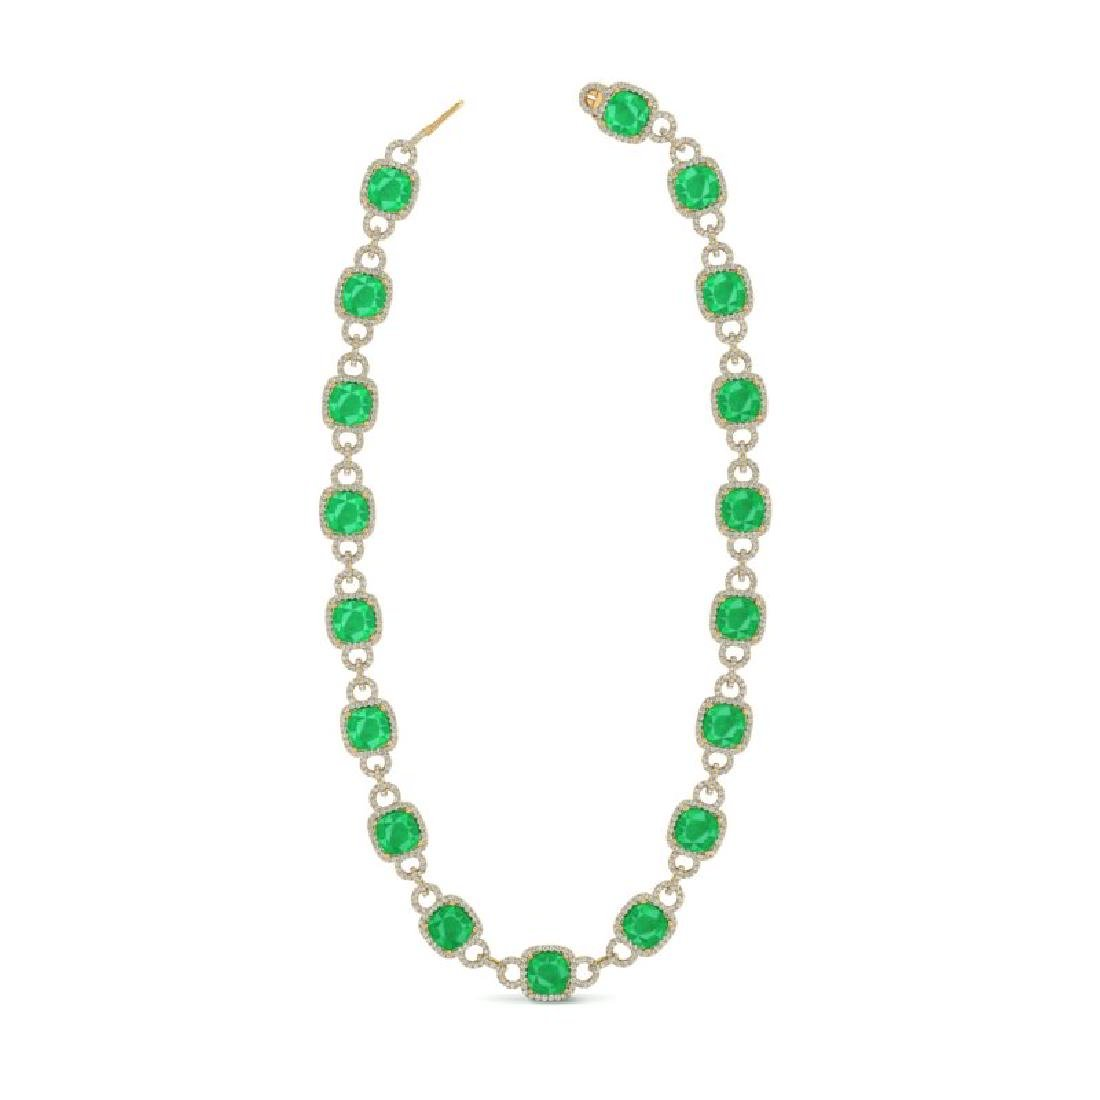 56 CTW Emerald & VS/SI Diamond Necklace 14K Yellow Gold - 2